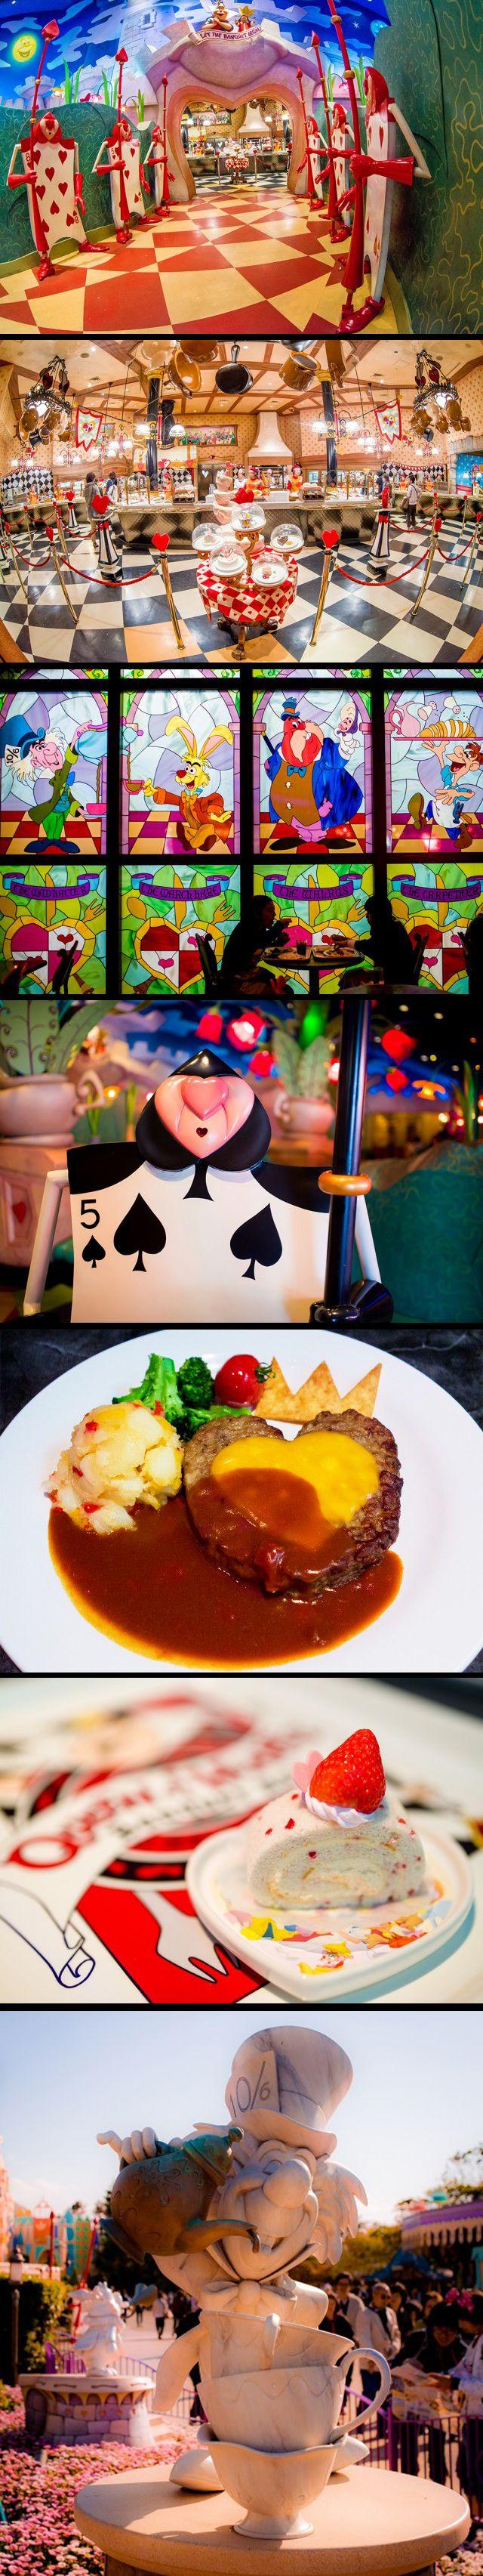 Hearts Banquet Hall, one of the coolest restaurants in Tokyo Disneyland.